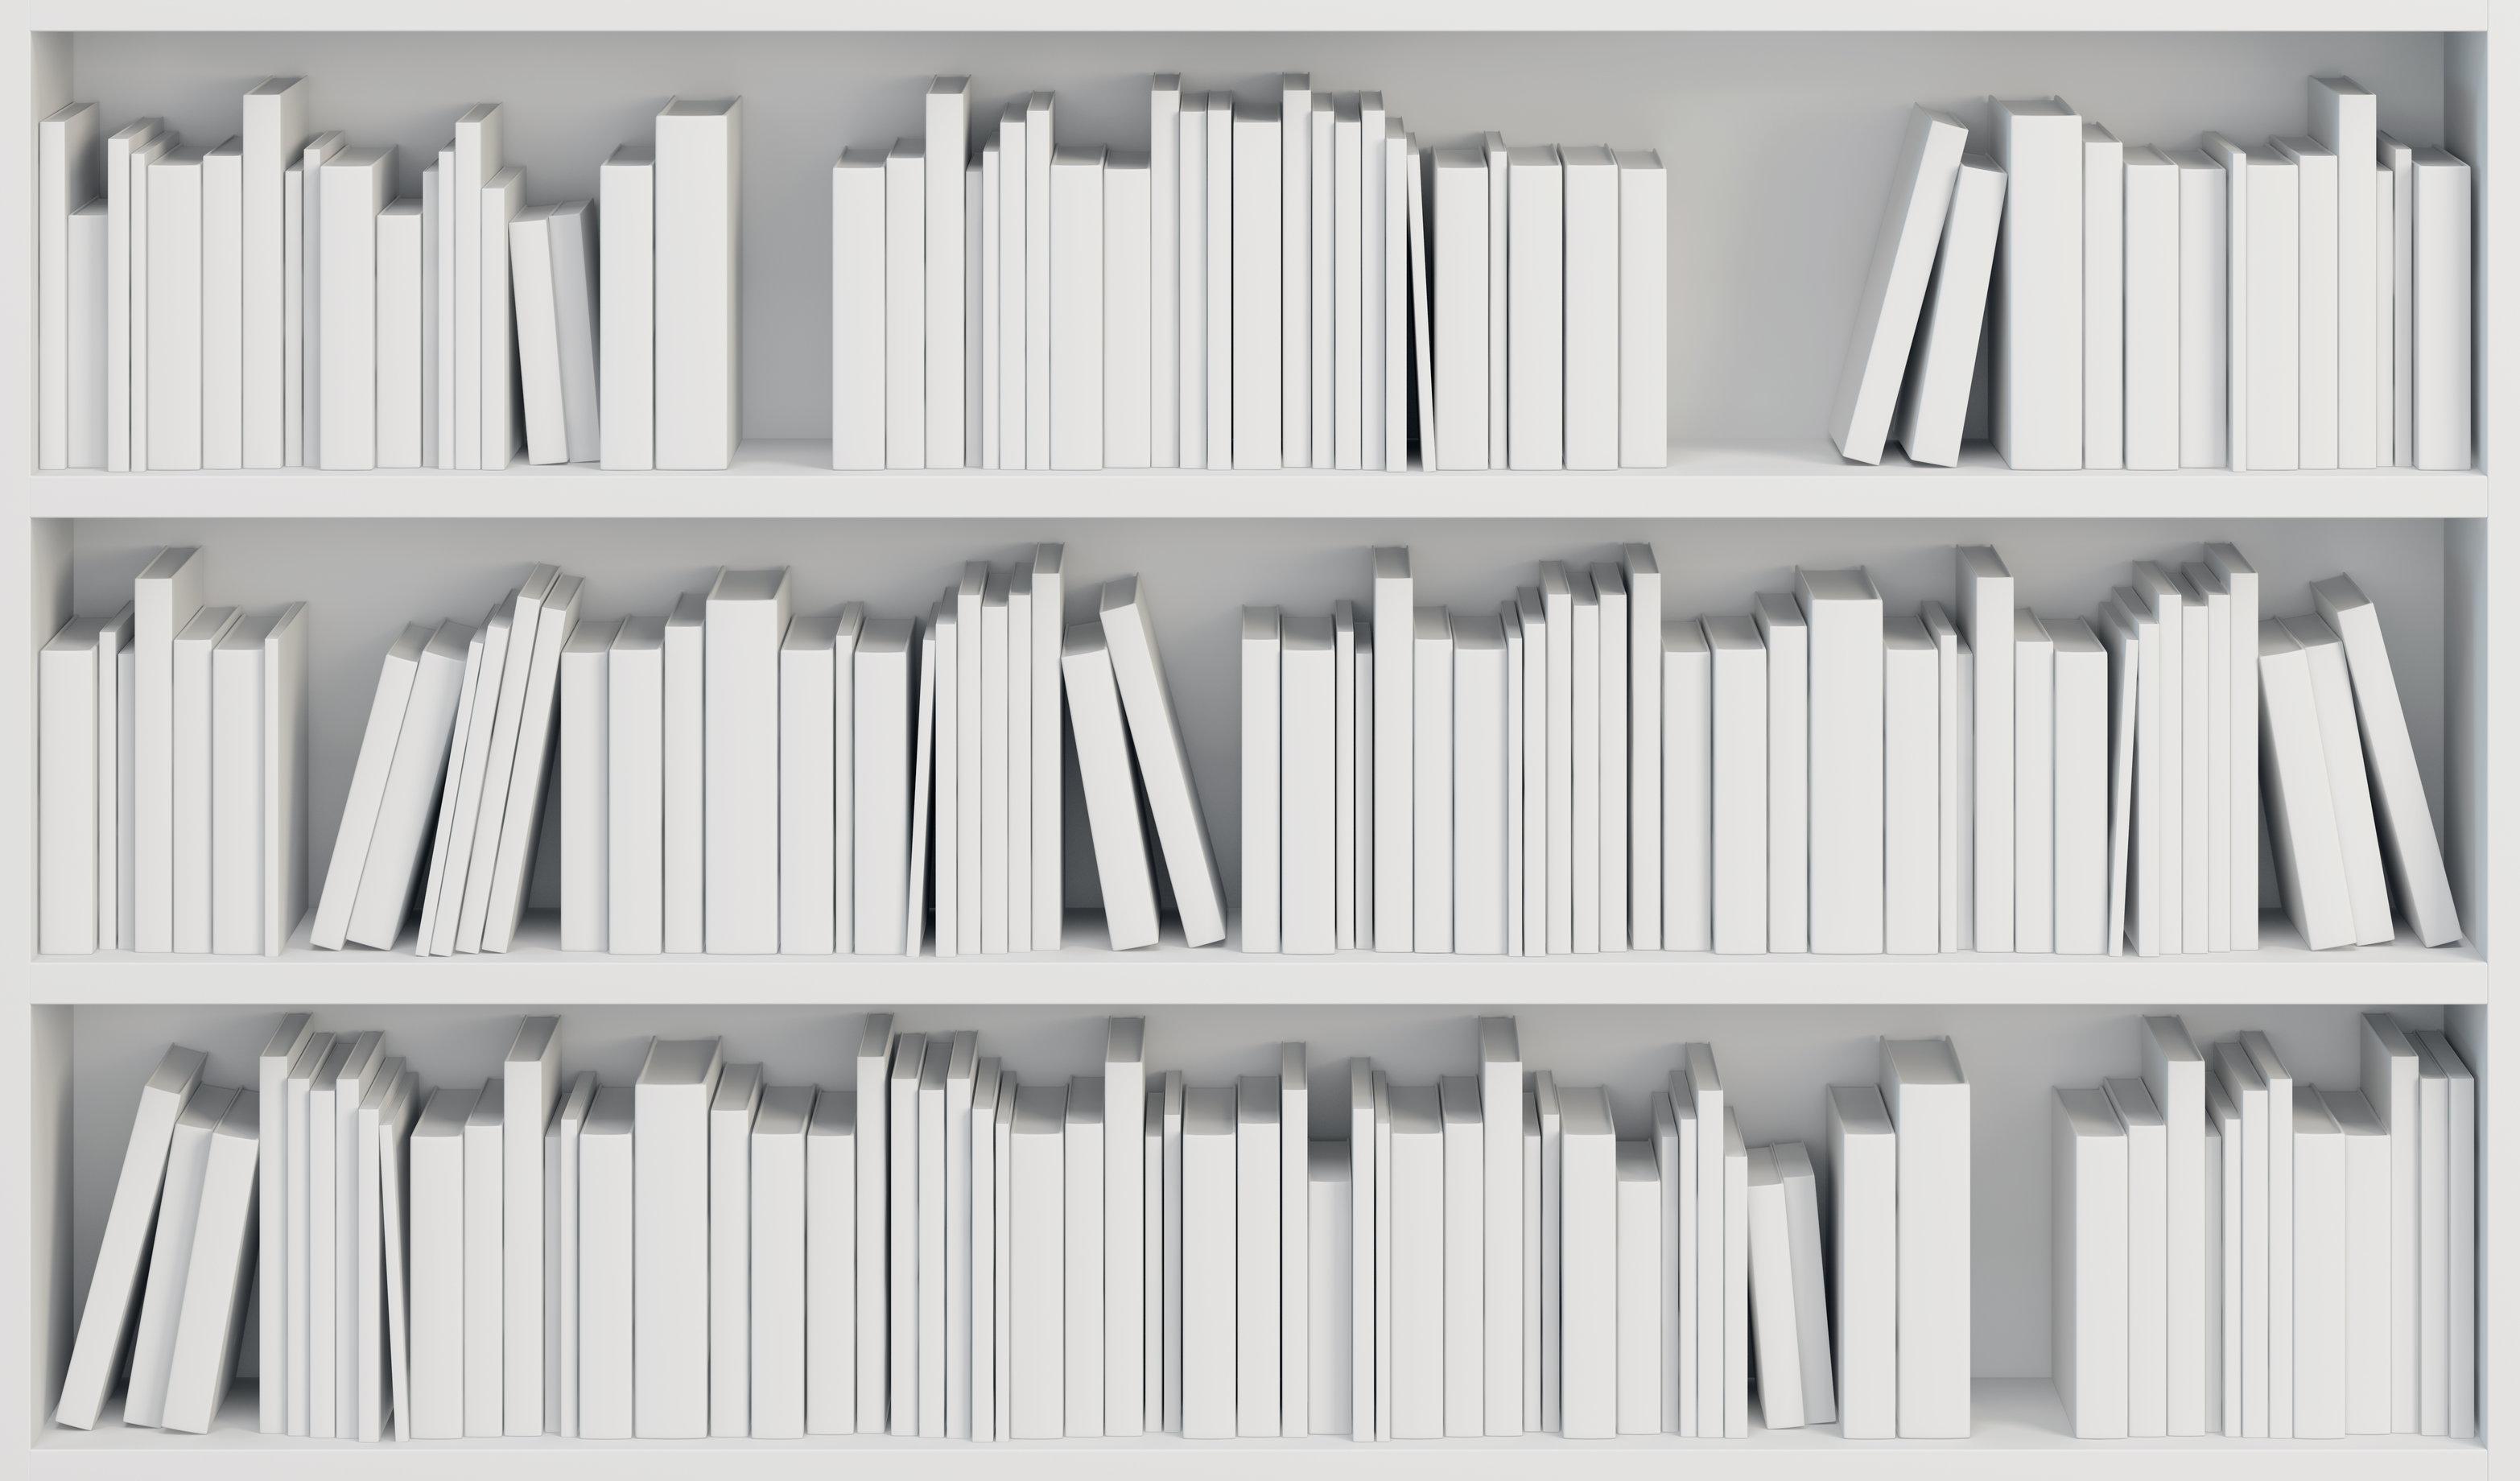 rsz_white_library.jpg